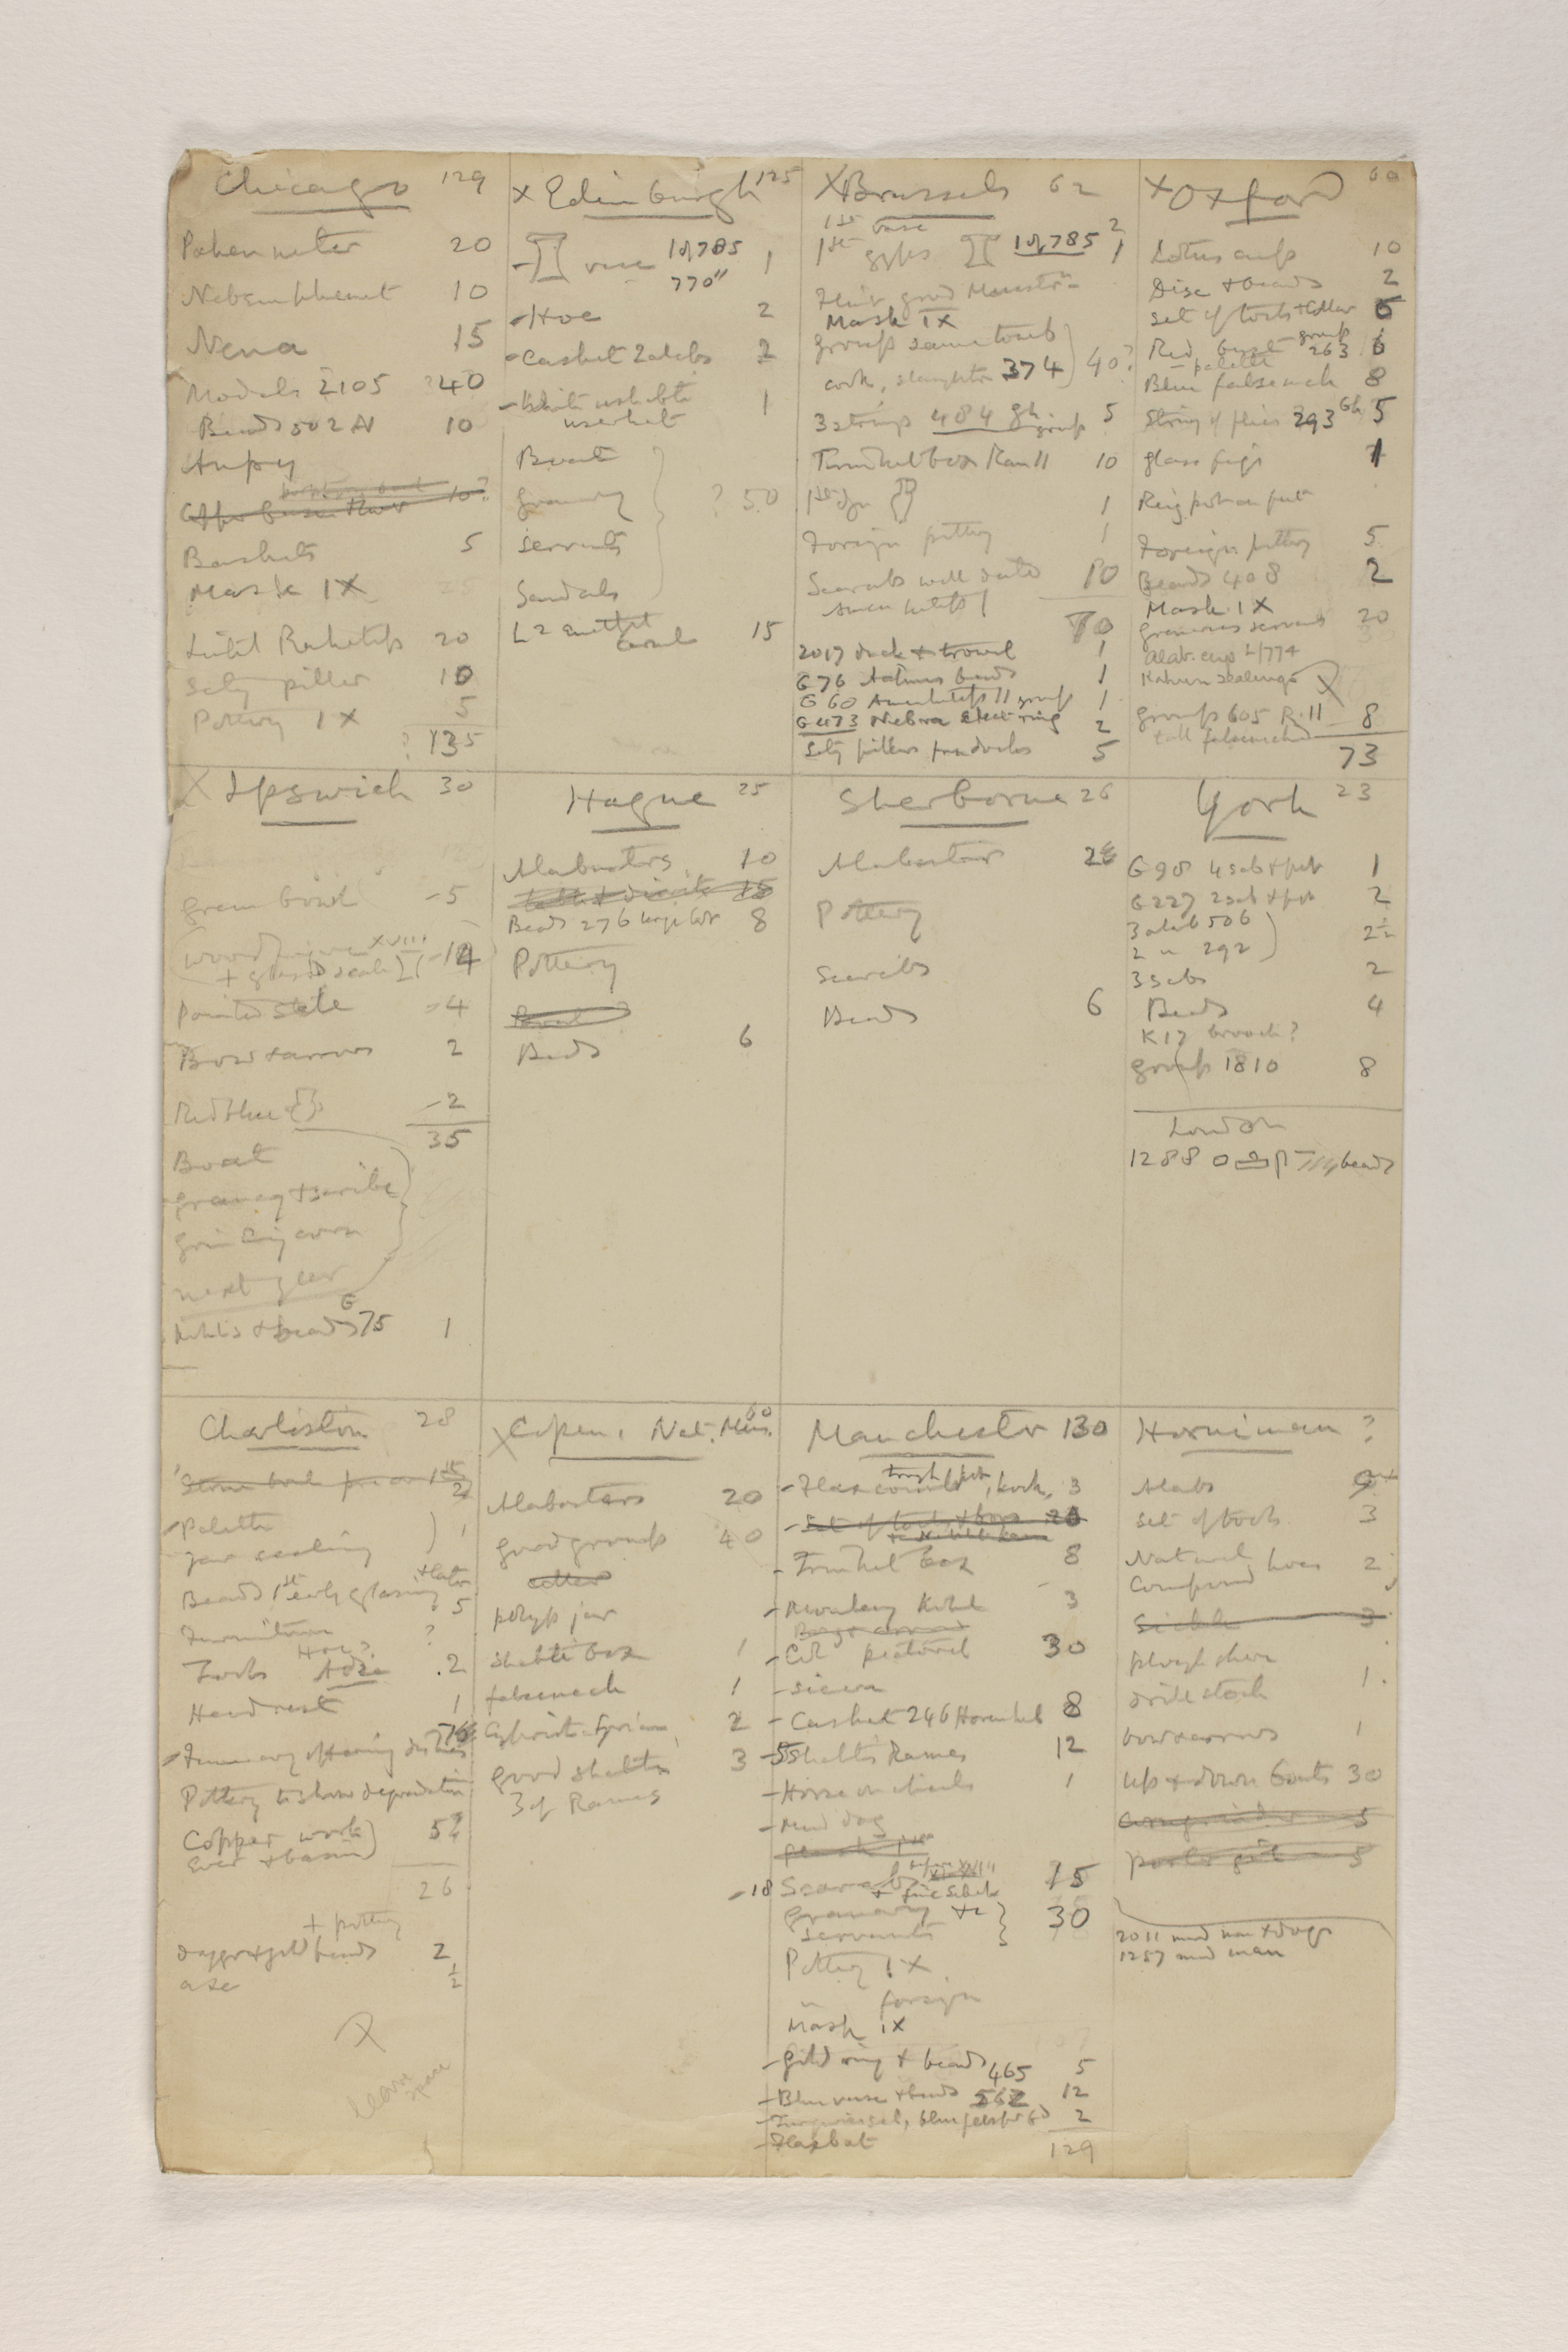 1919-21 Sedment, Lahun Multiple institution list PMA/WFP1/D/24/9.1